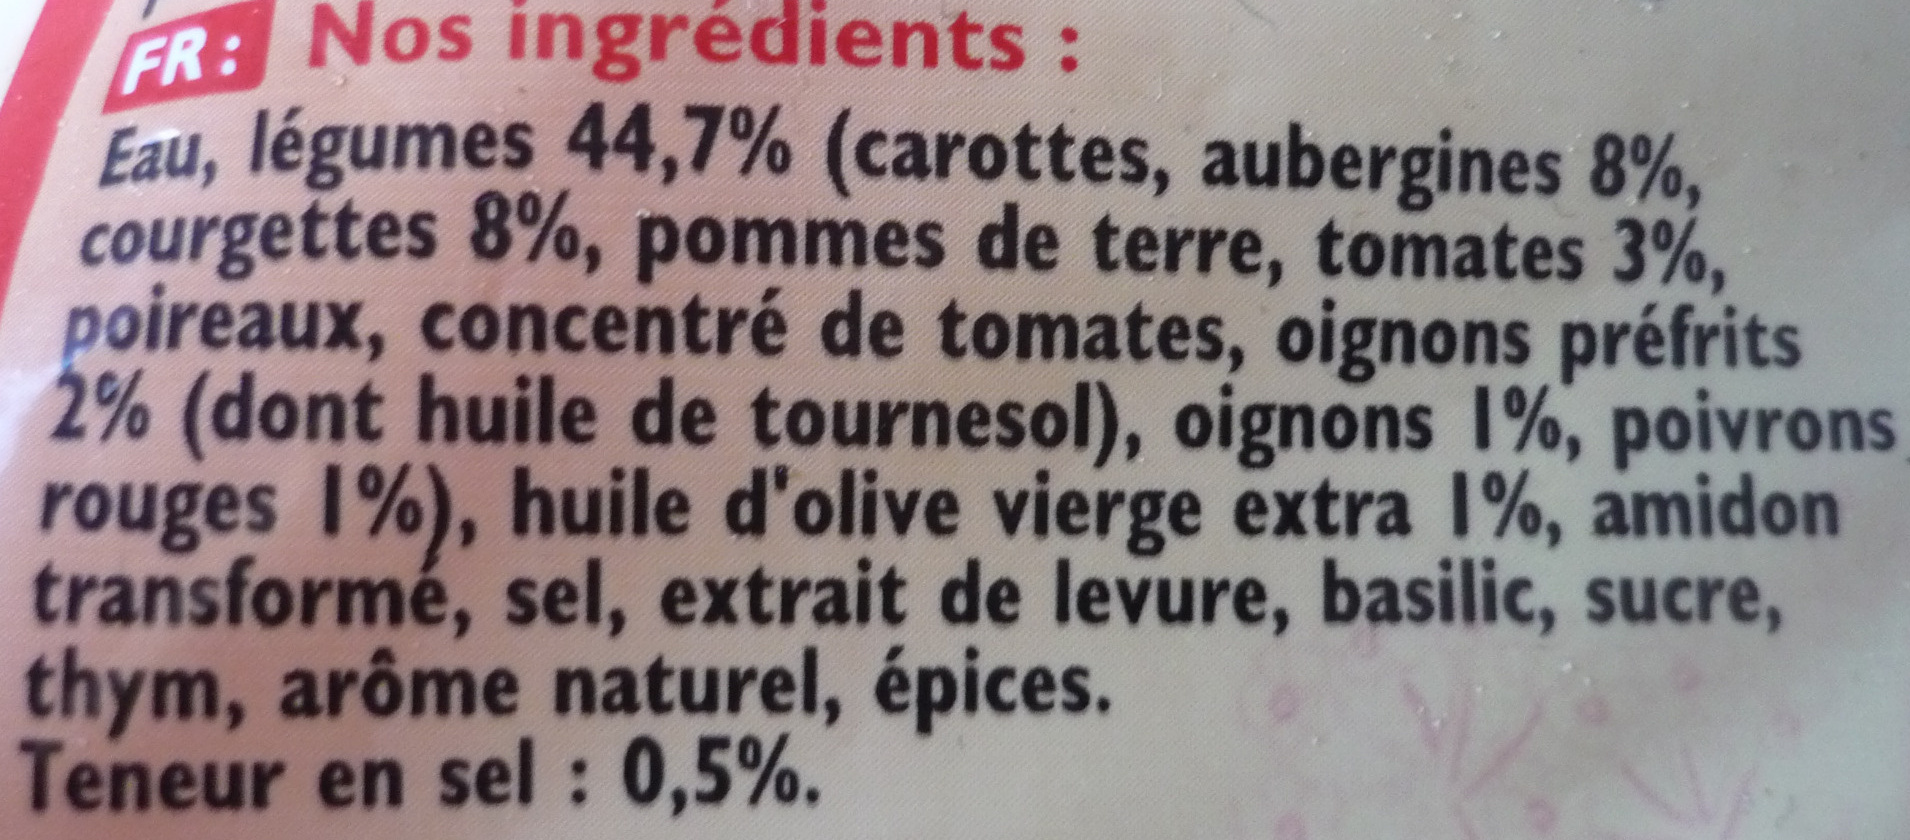 Velouté légumes provençaux - Ingrediënten